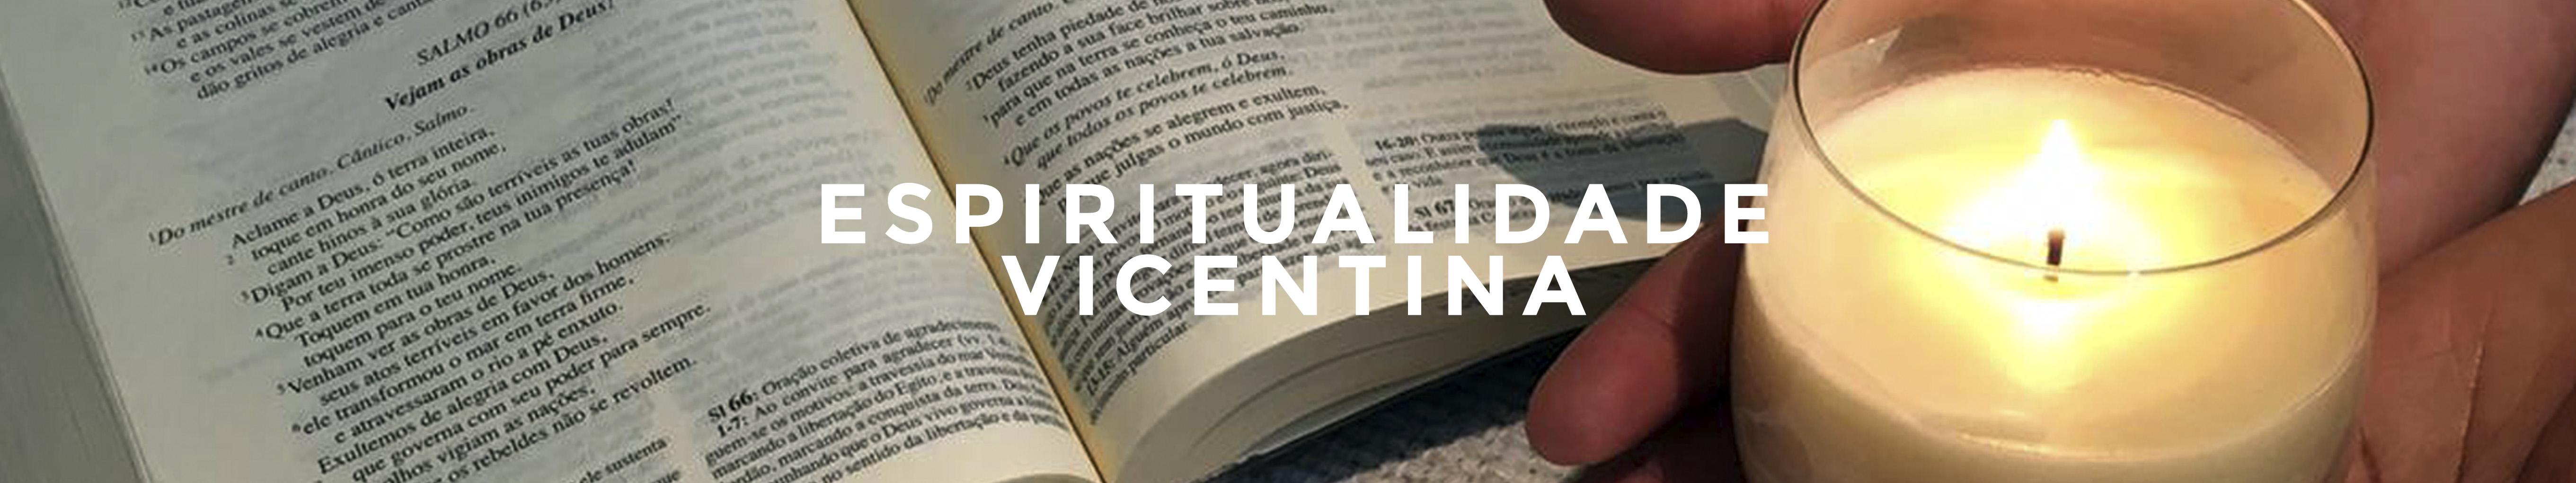 Espiritualidade Vicentina